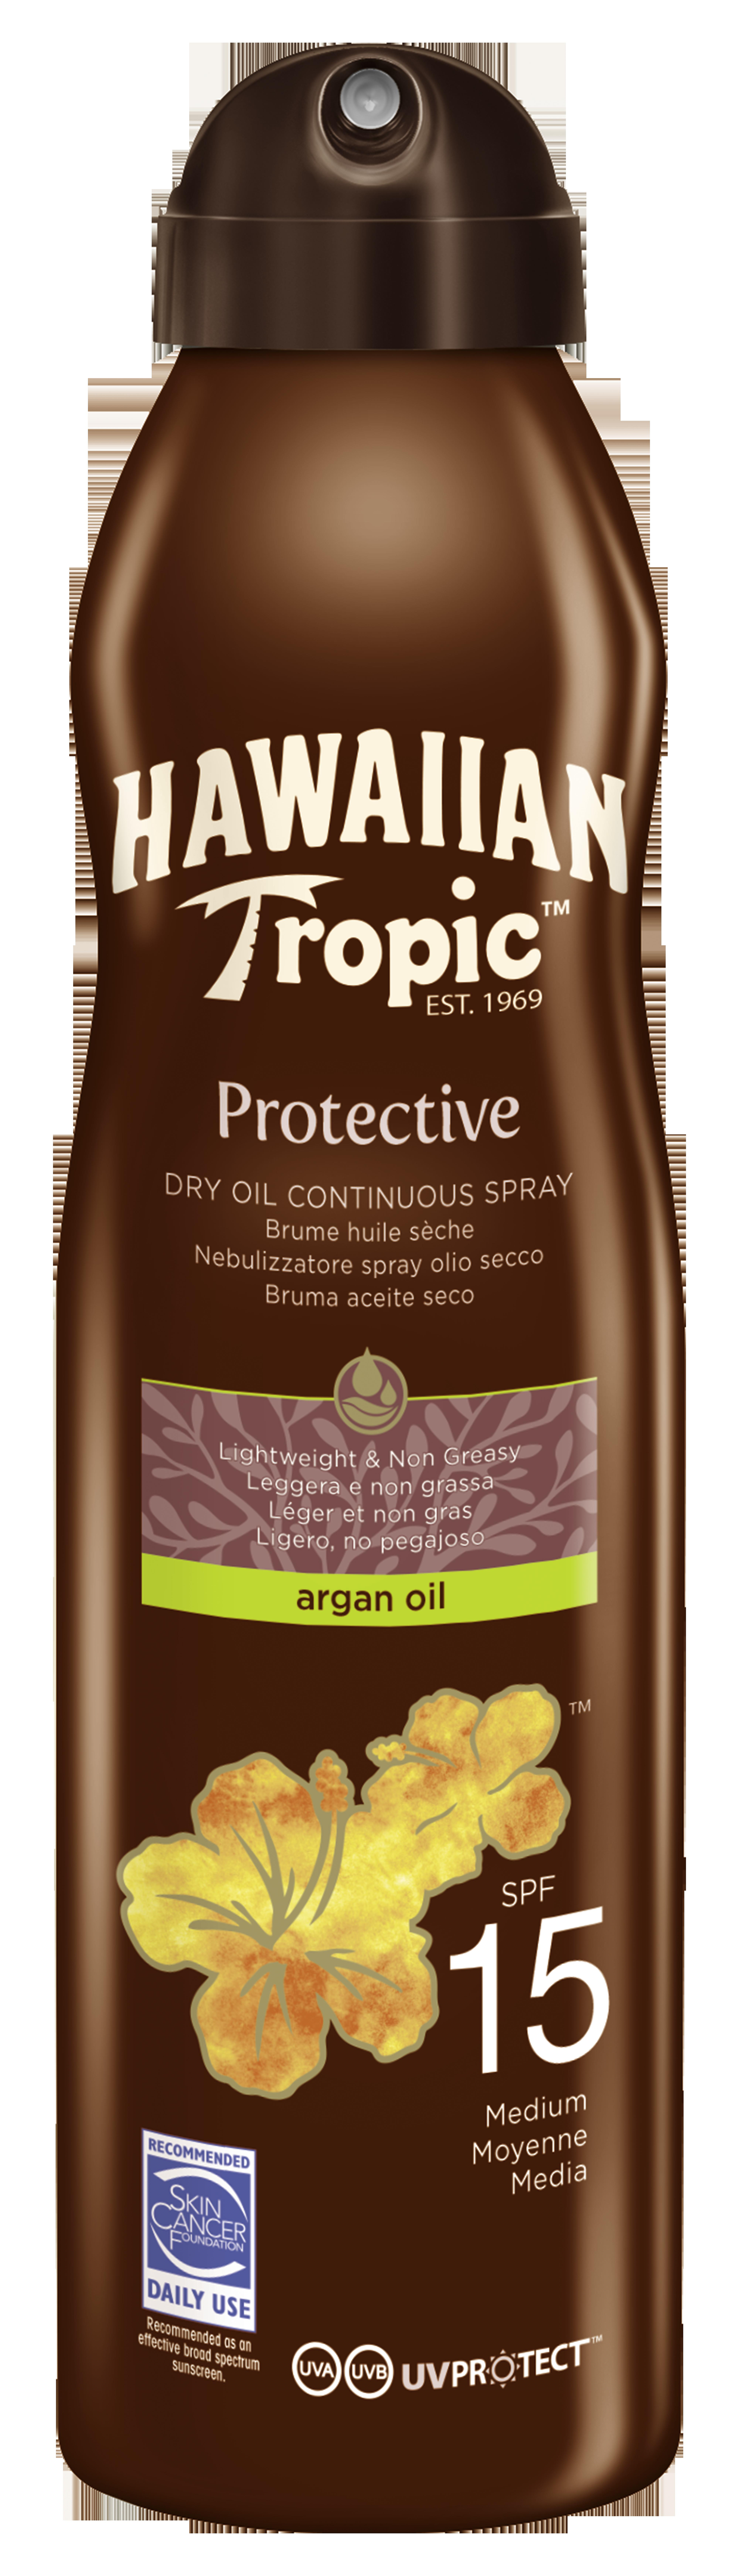 Protective Oil Dry Oil Argan C-Spray SPF 15